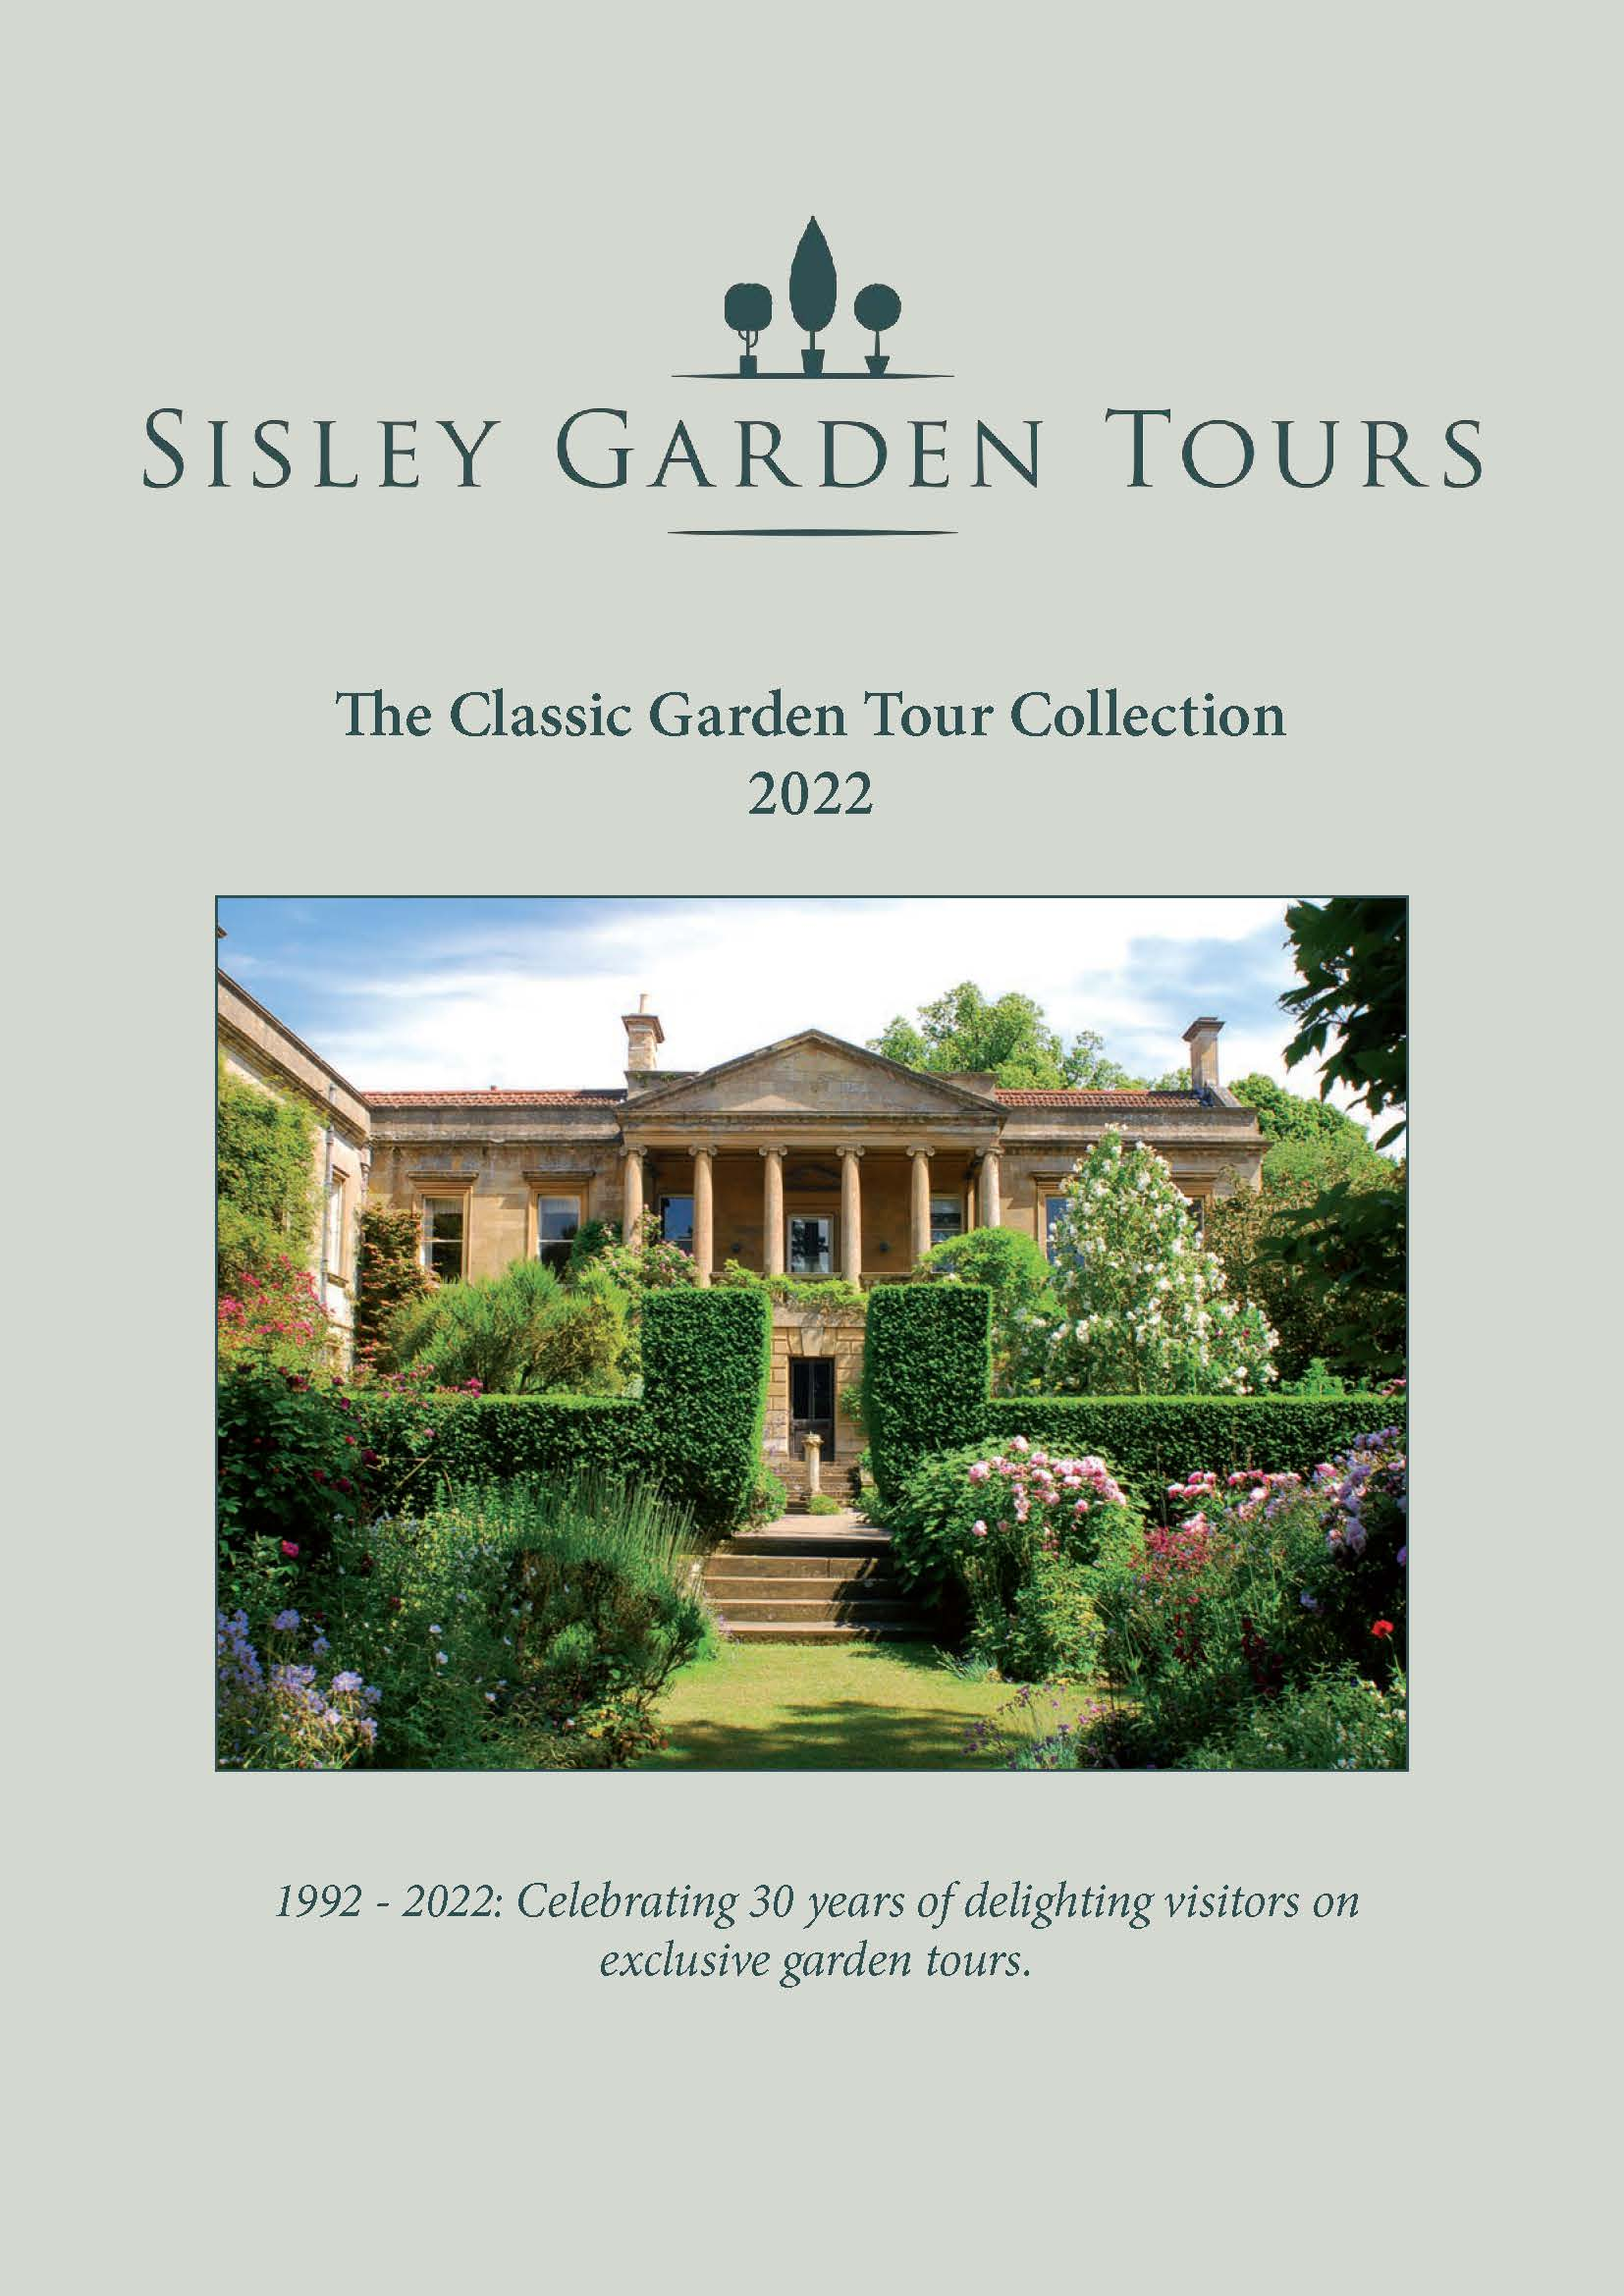 Sisley_Garden_Tours_Brochure_2022_Front cover